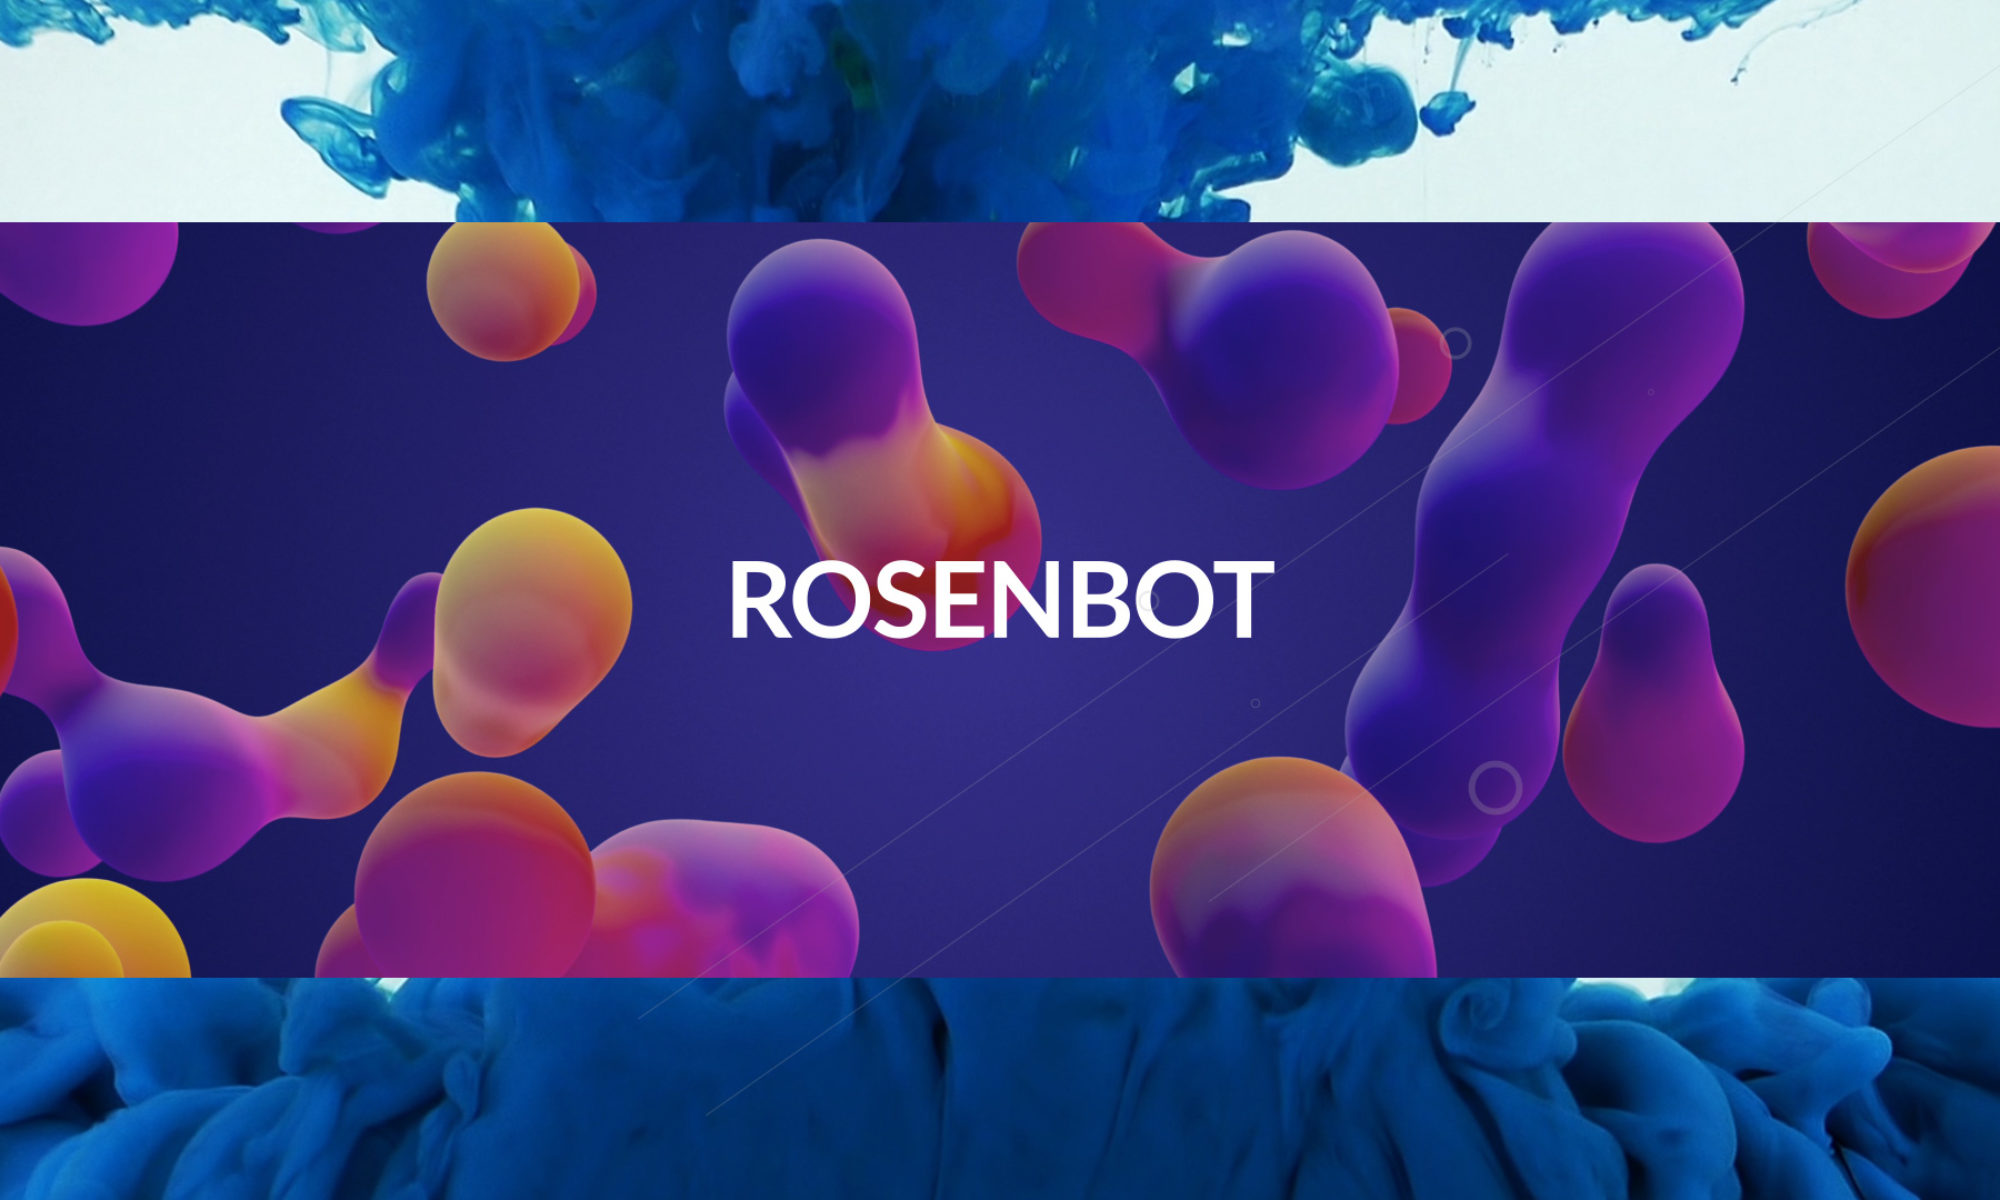 ROSENBOT. Creative and Media Company / VFX / TV & Film Production.